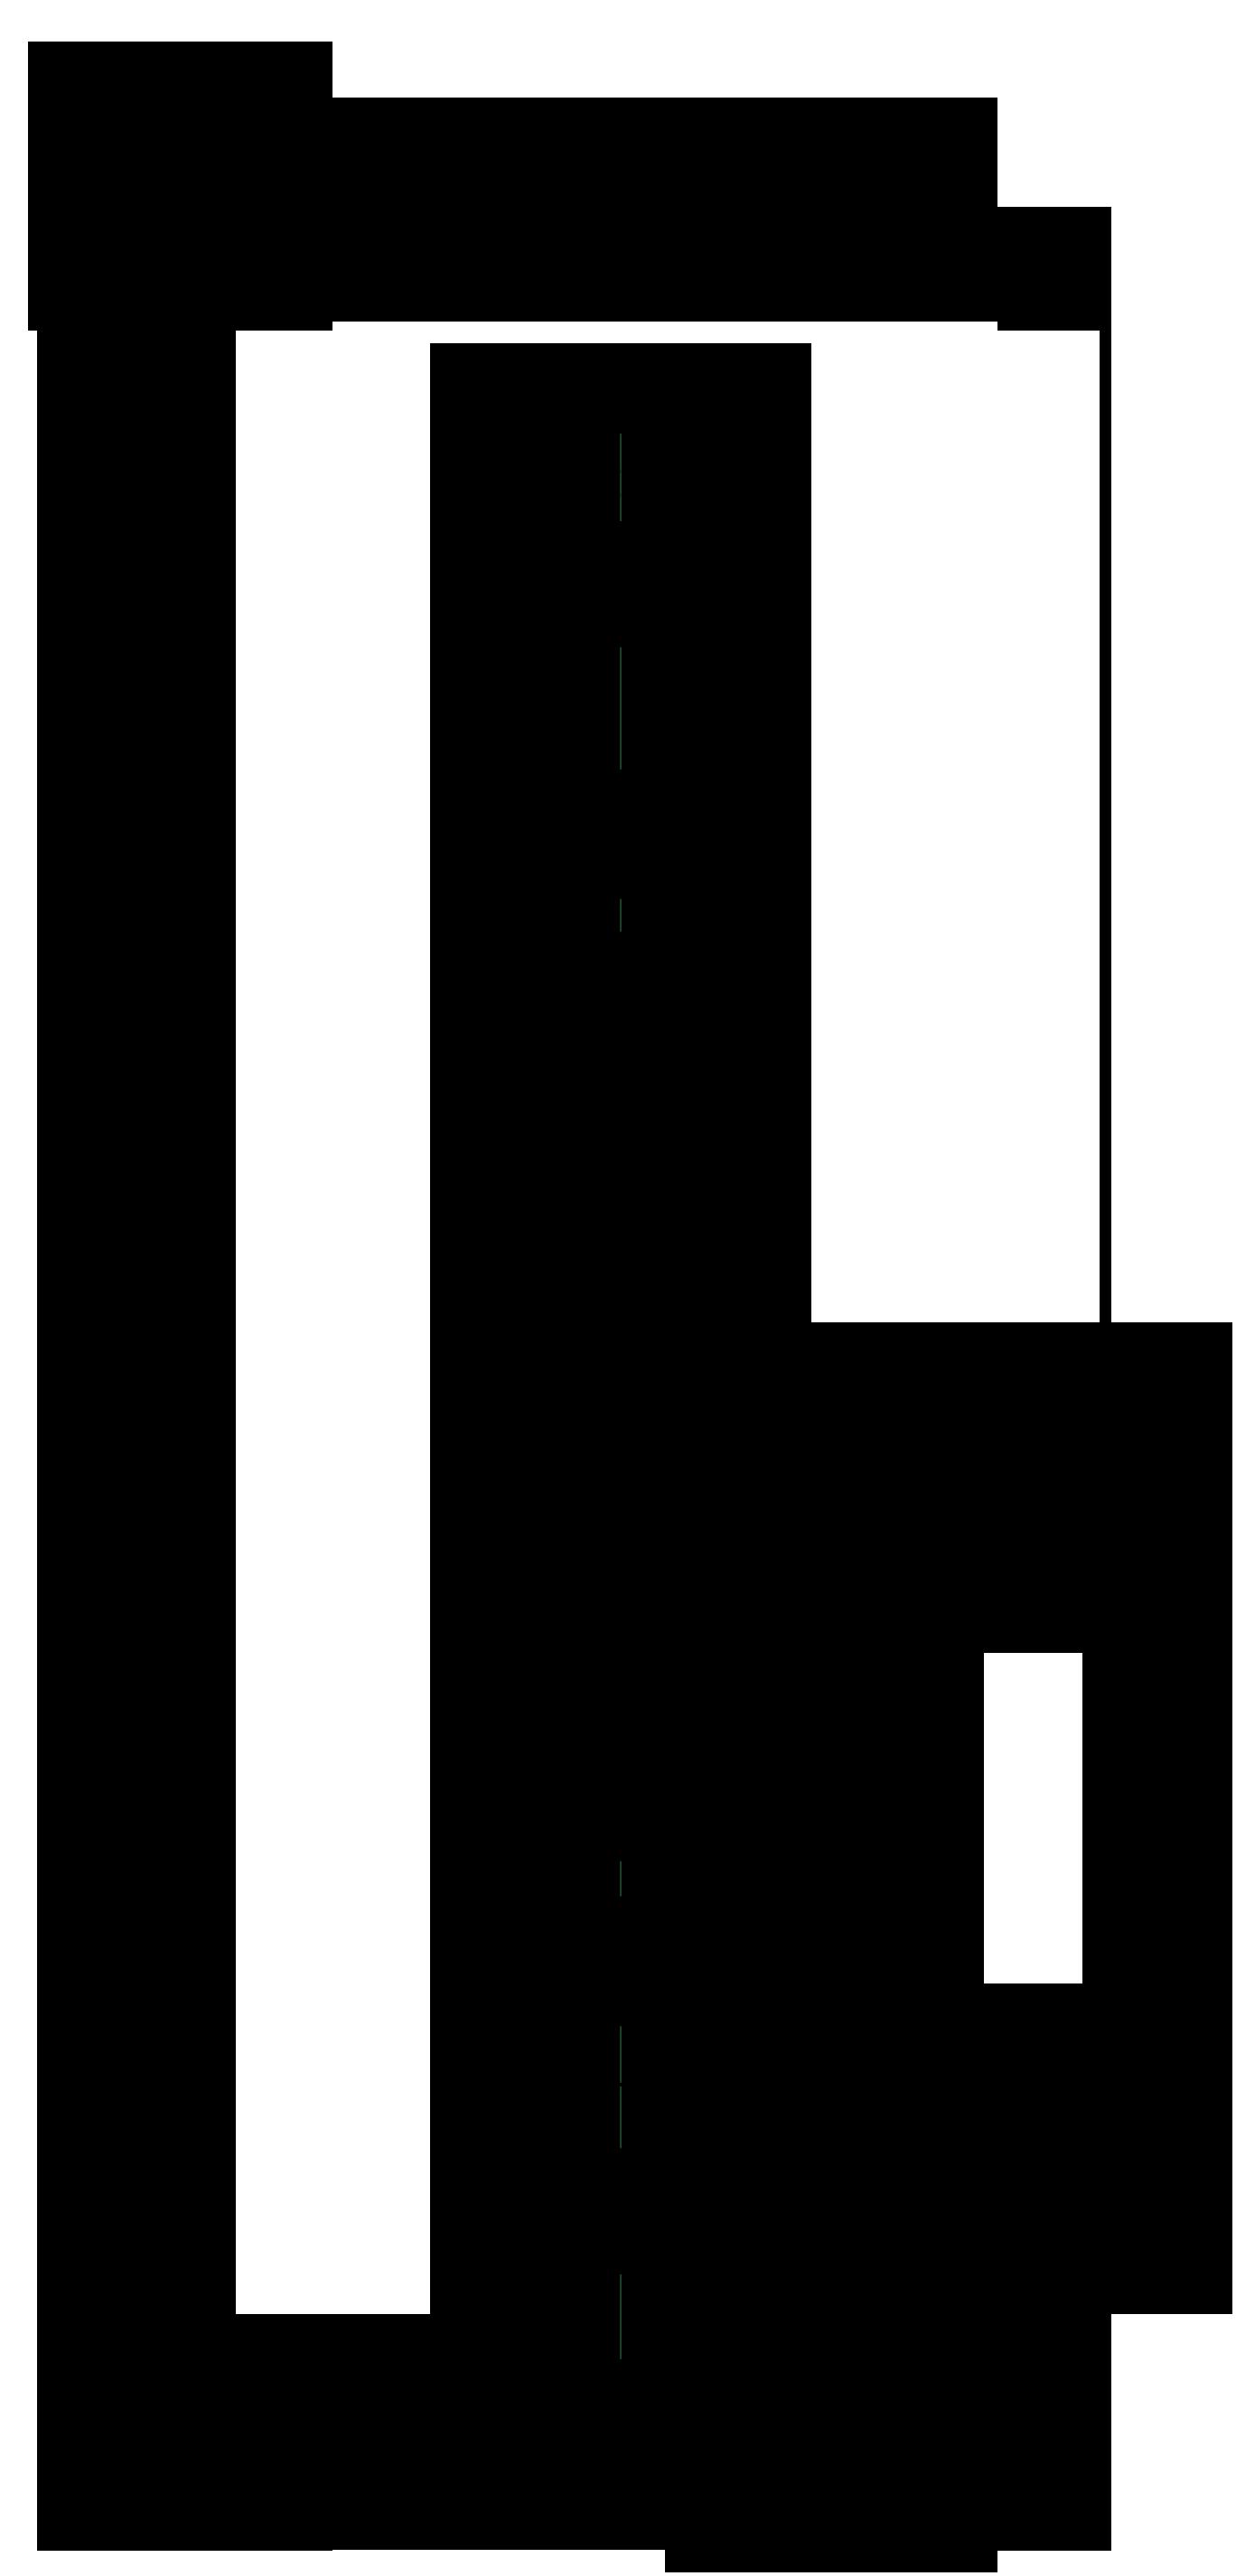 схема датчика моточасов